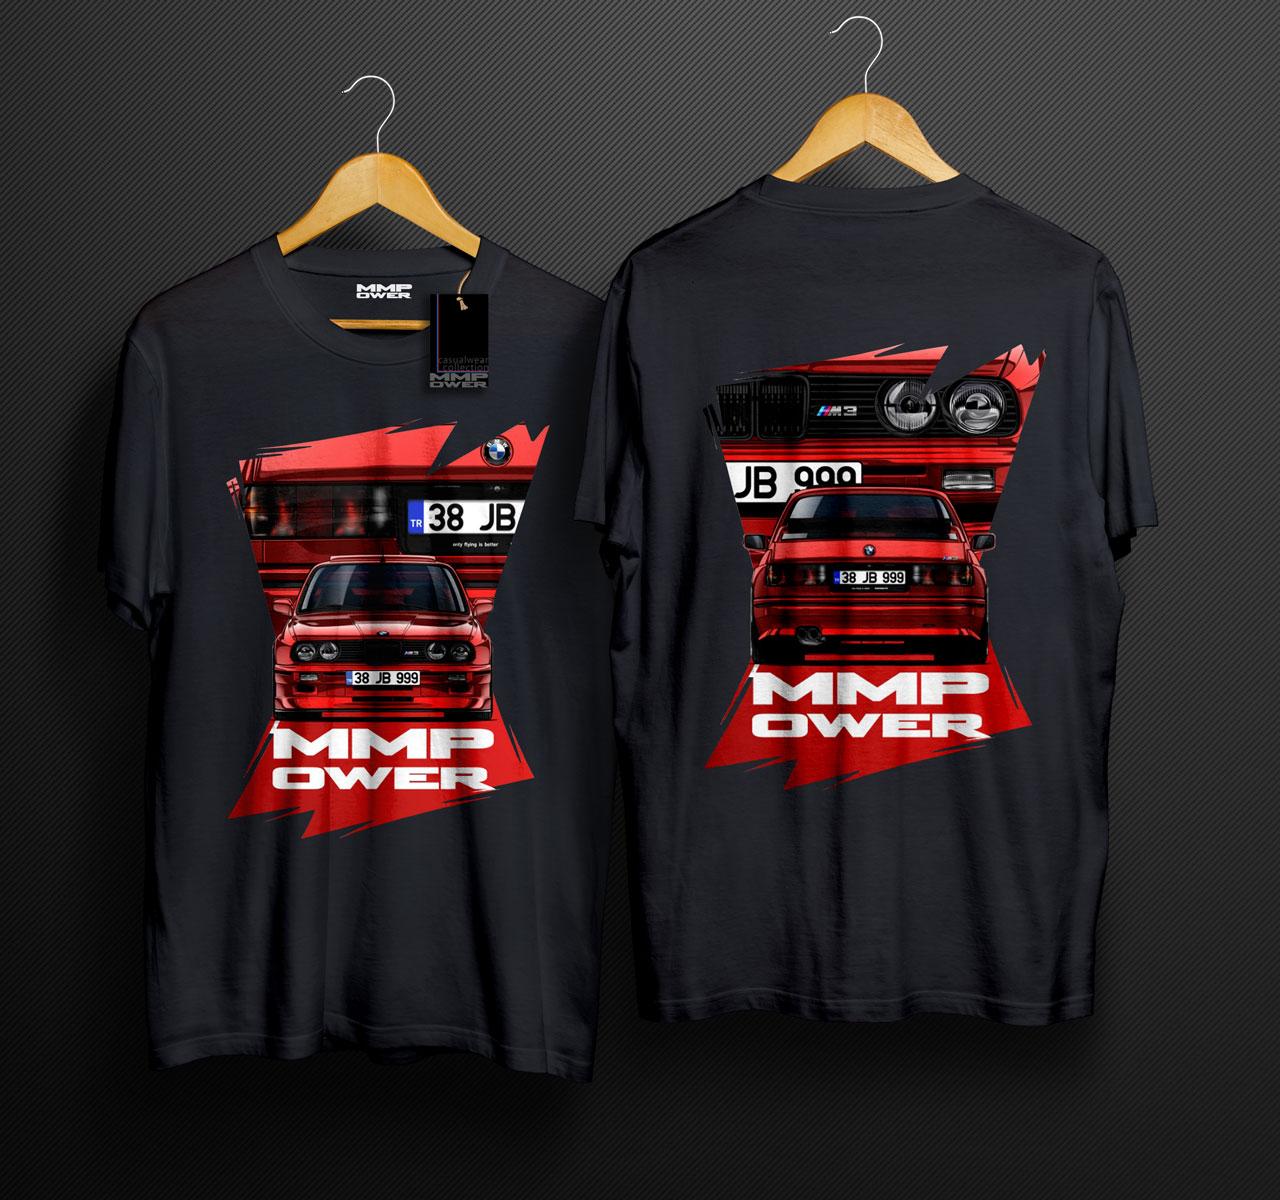 MMPower E30 M3 Karekter TShirt Siyah